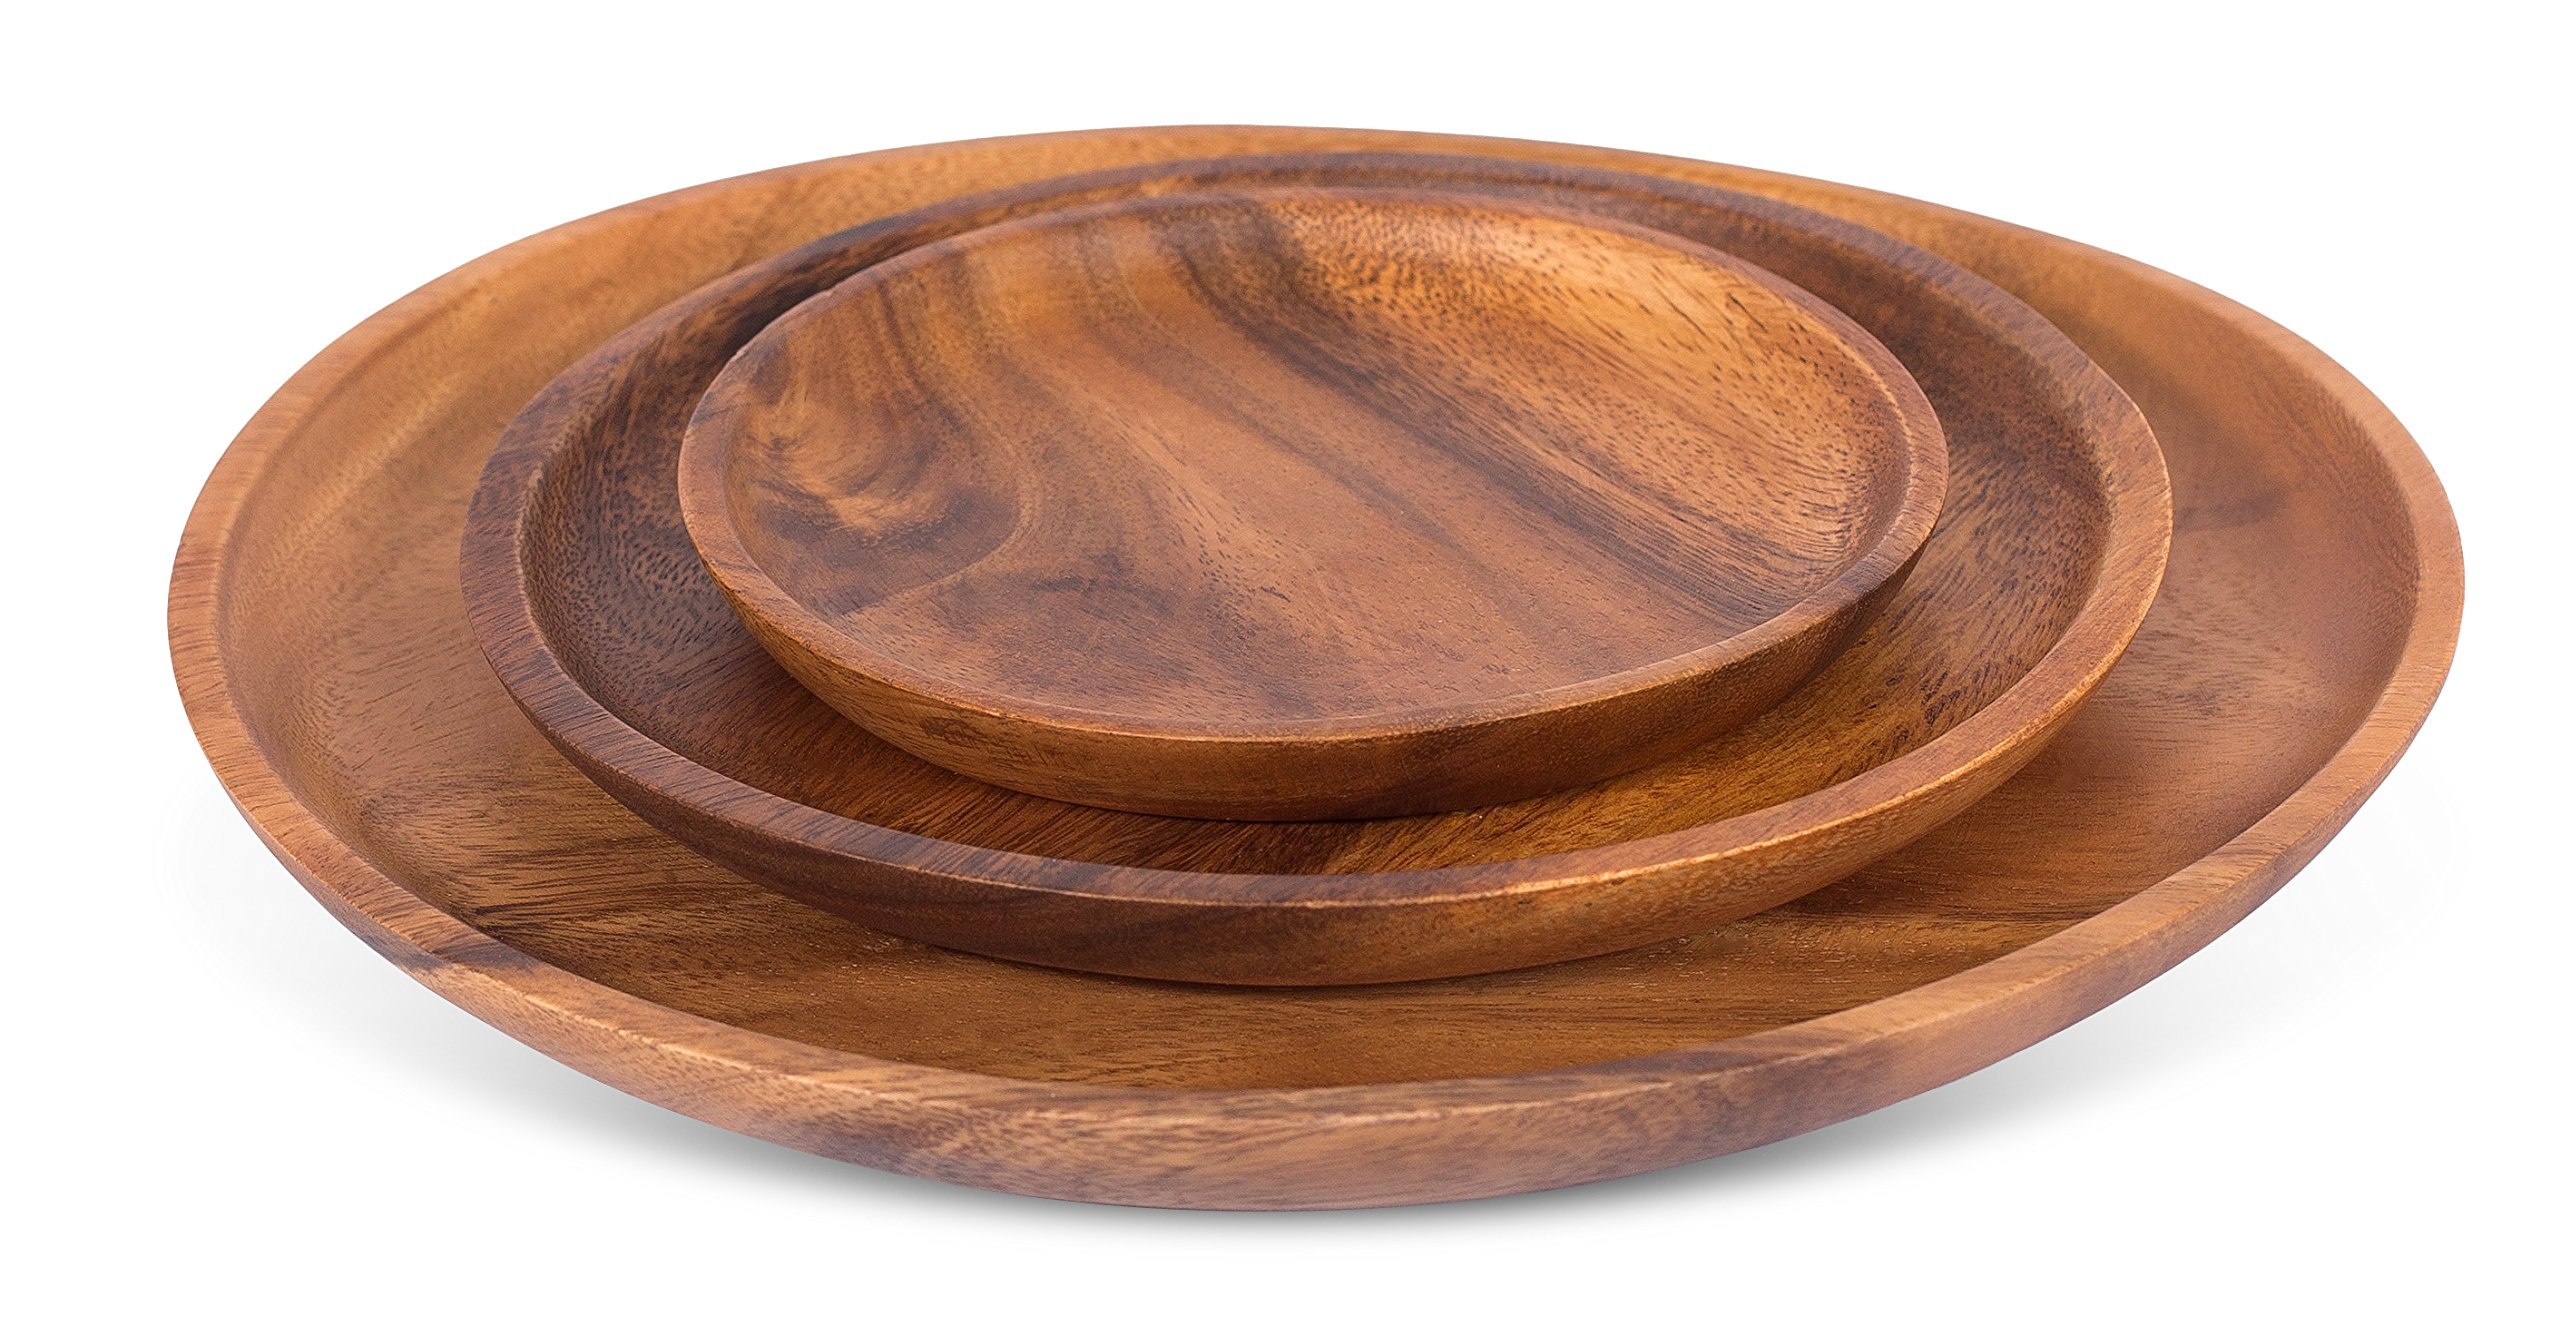 BirdRock Home Acacia Round Platters | Set of 3 | Acacia Wood Plates